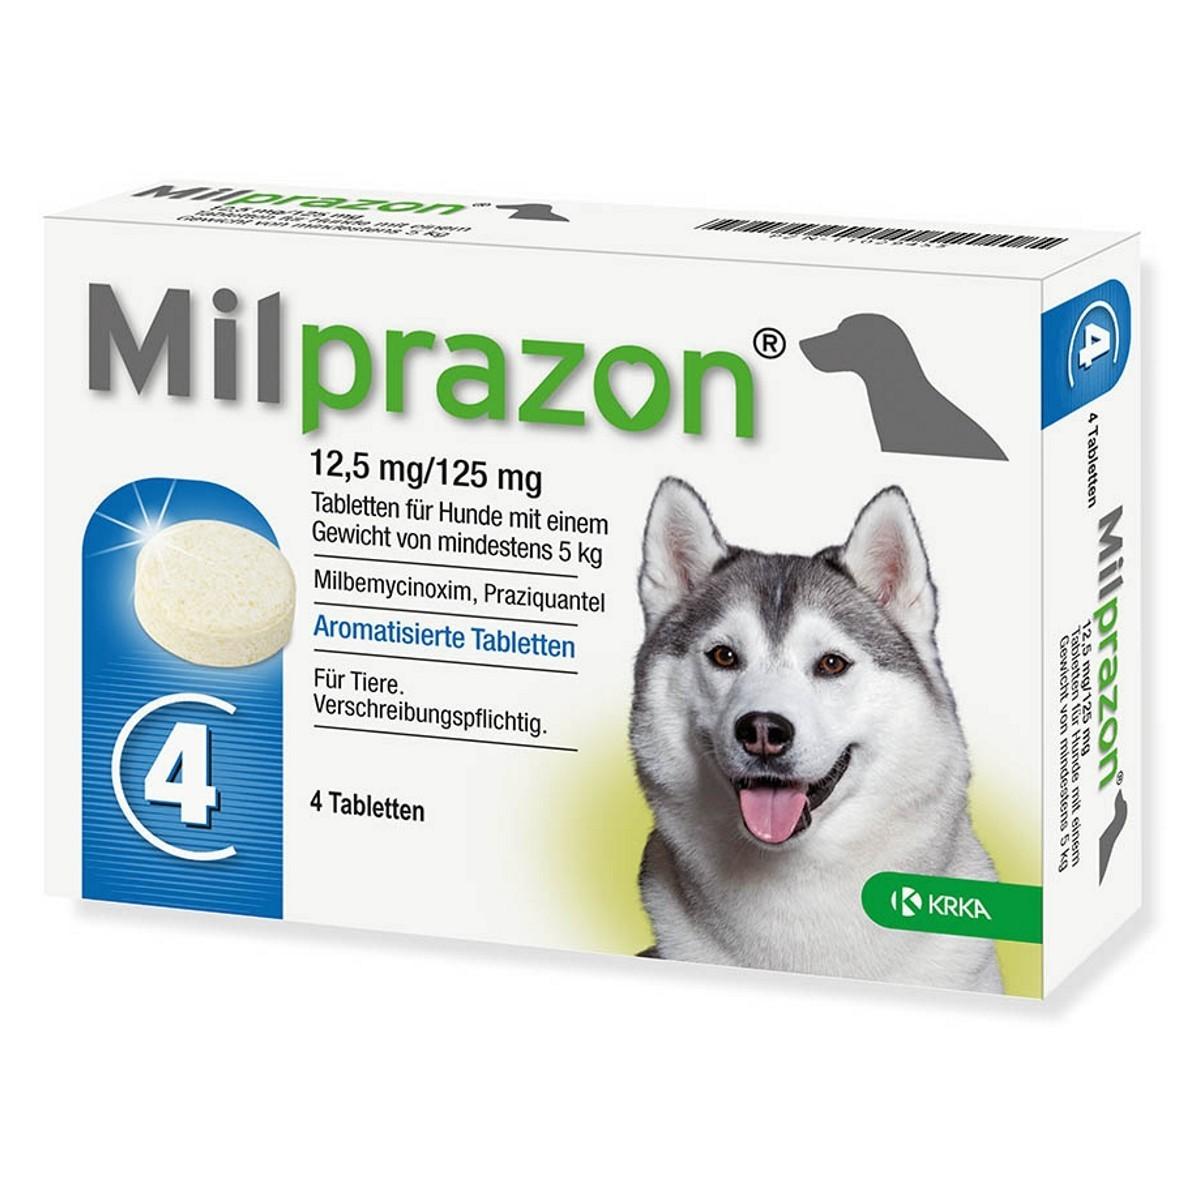 Milprazon 12,5 mg/125 mg. 5-25kg šunims  - 1 tab.